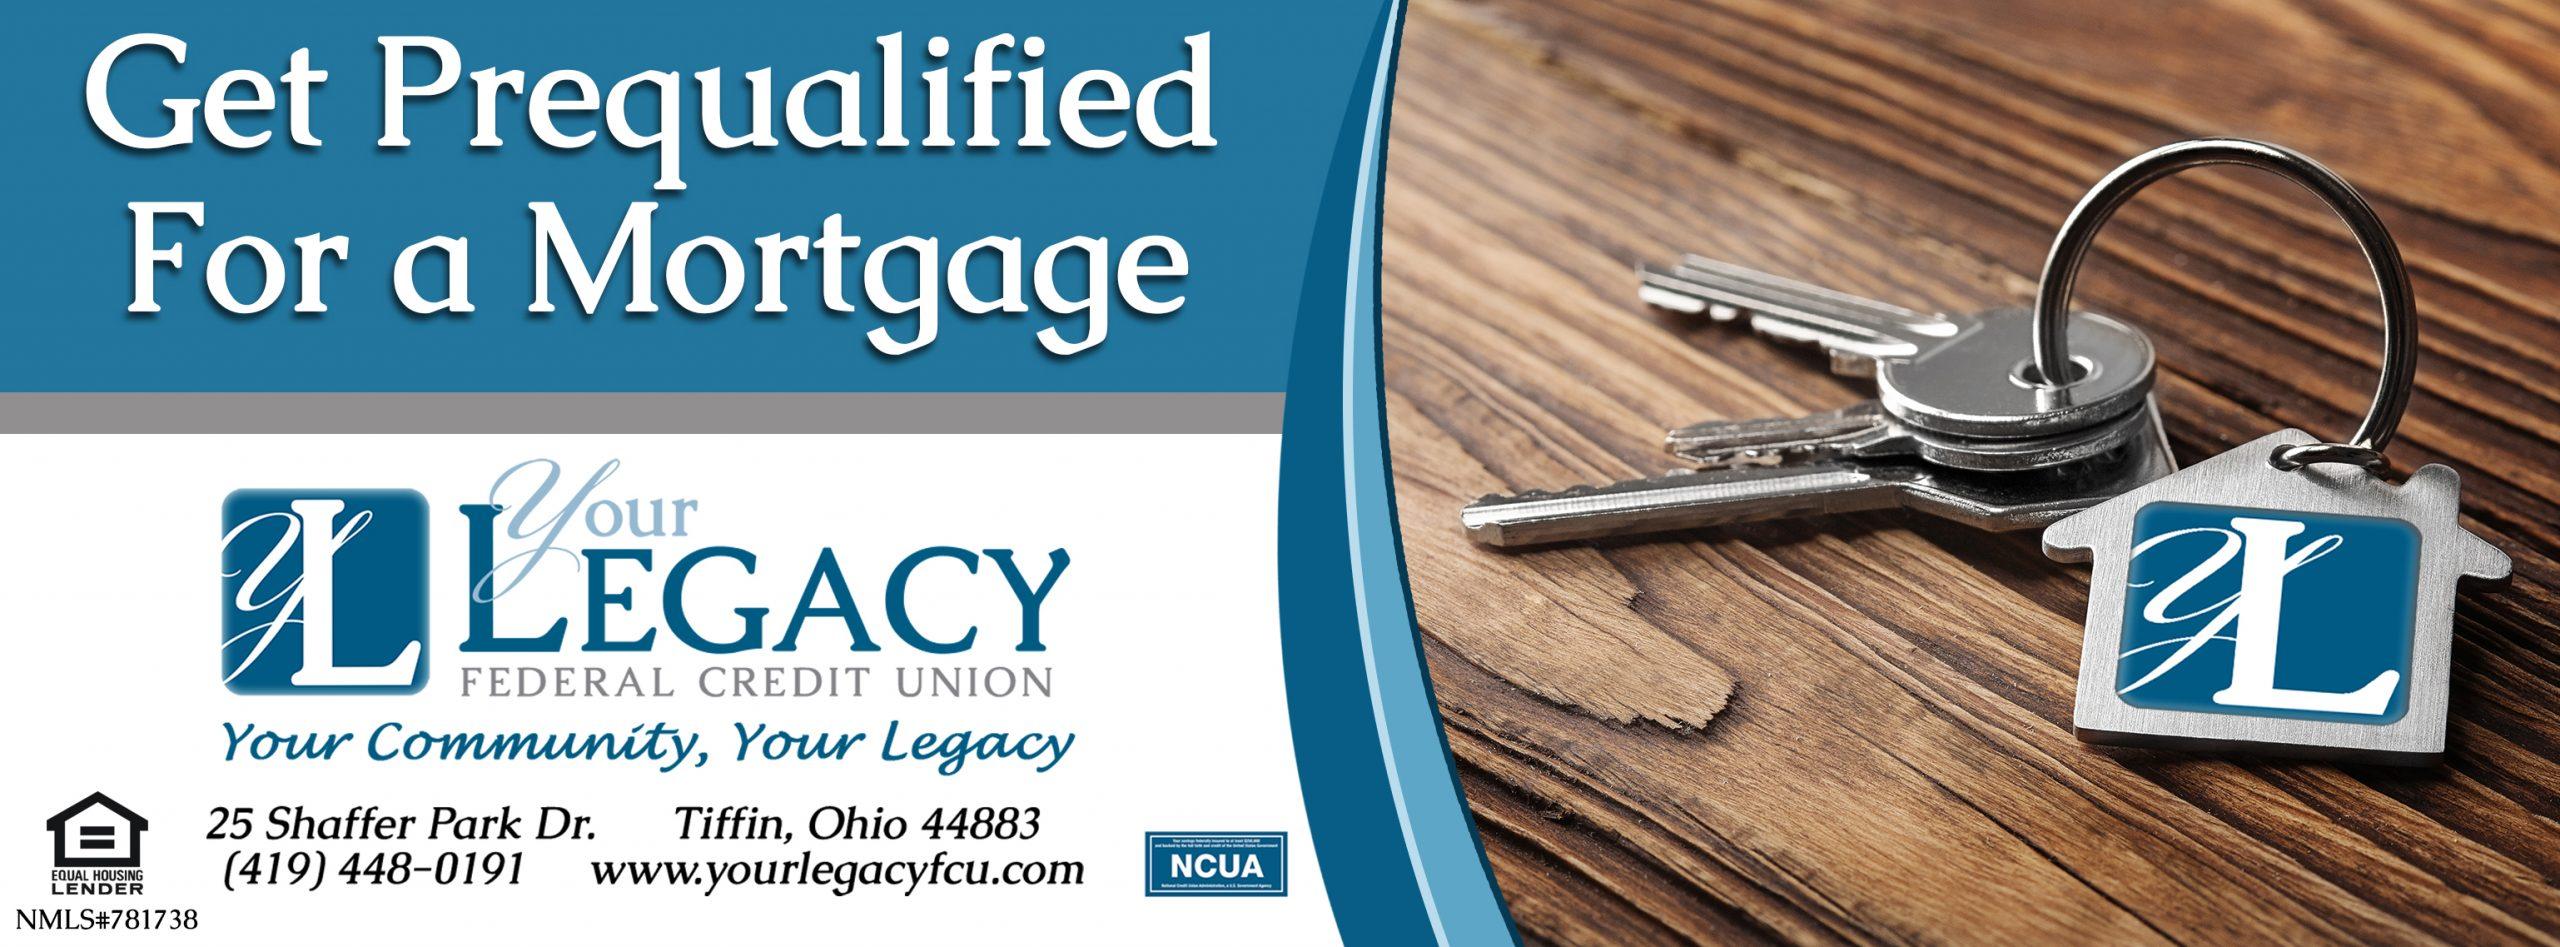 Mortgage Apply